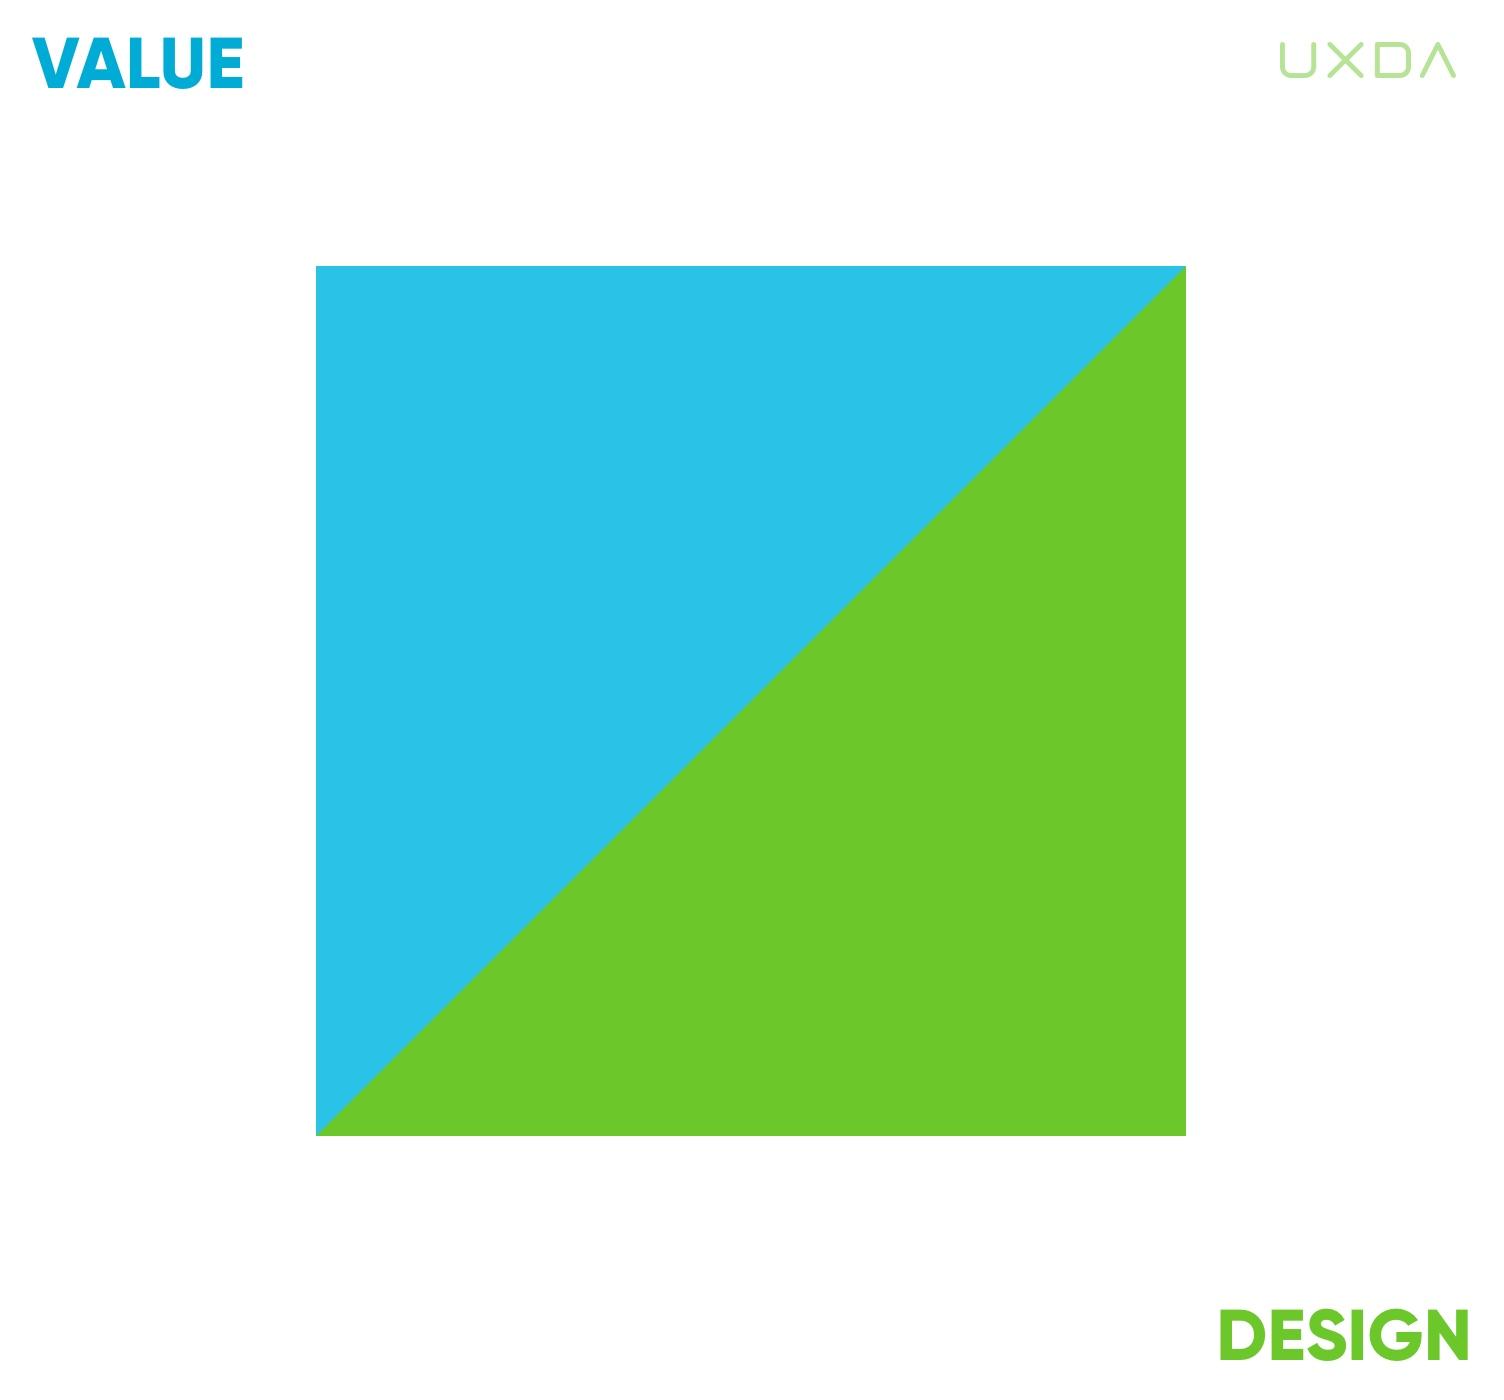 financial-design-matrix-for-banking-disruption-01.jpg